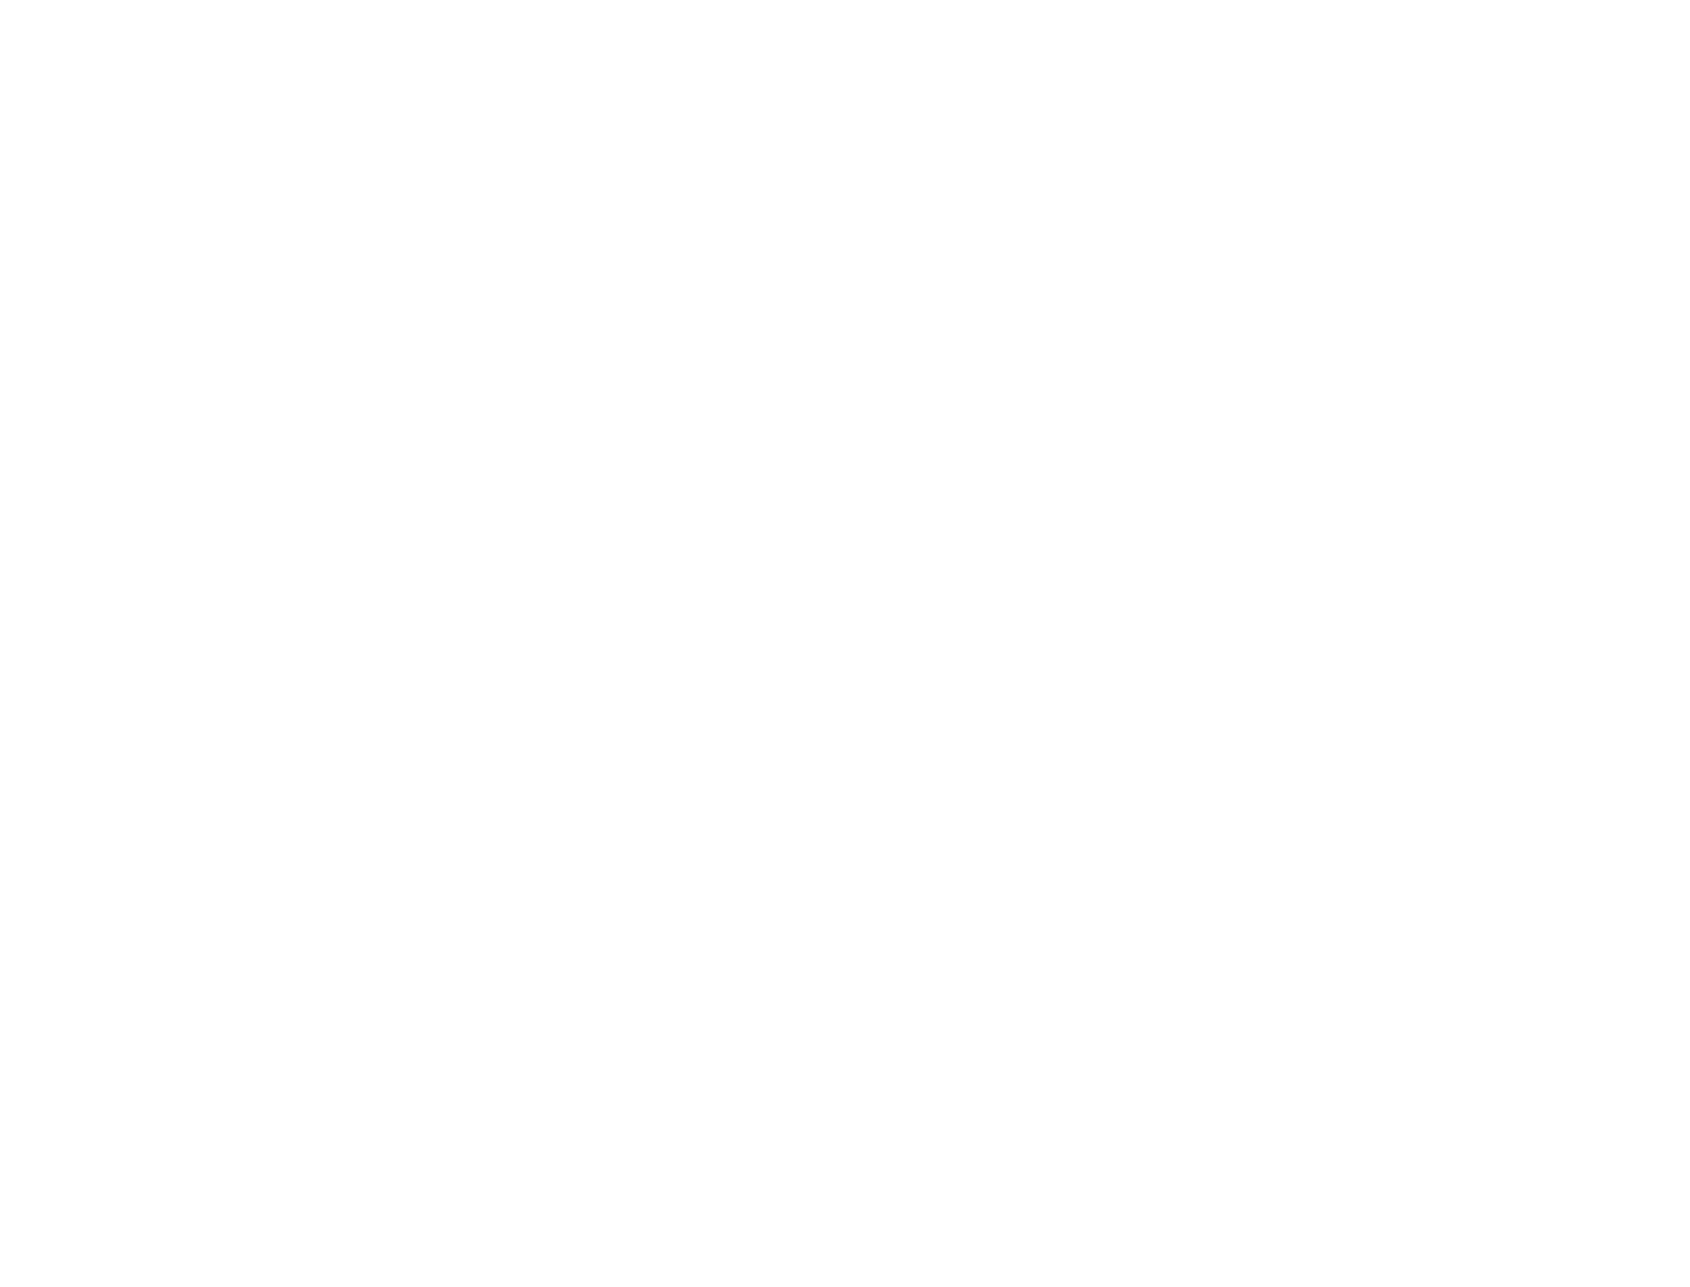 Best Free Bitcoin Cloud Mining - Earn Bitcoin Faster in 2019